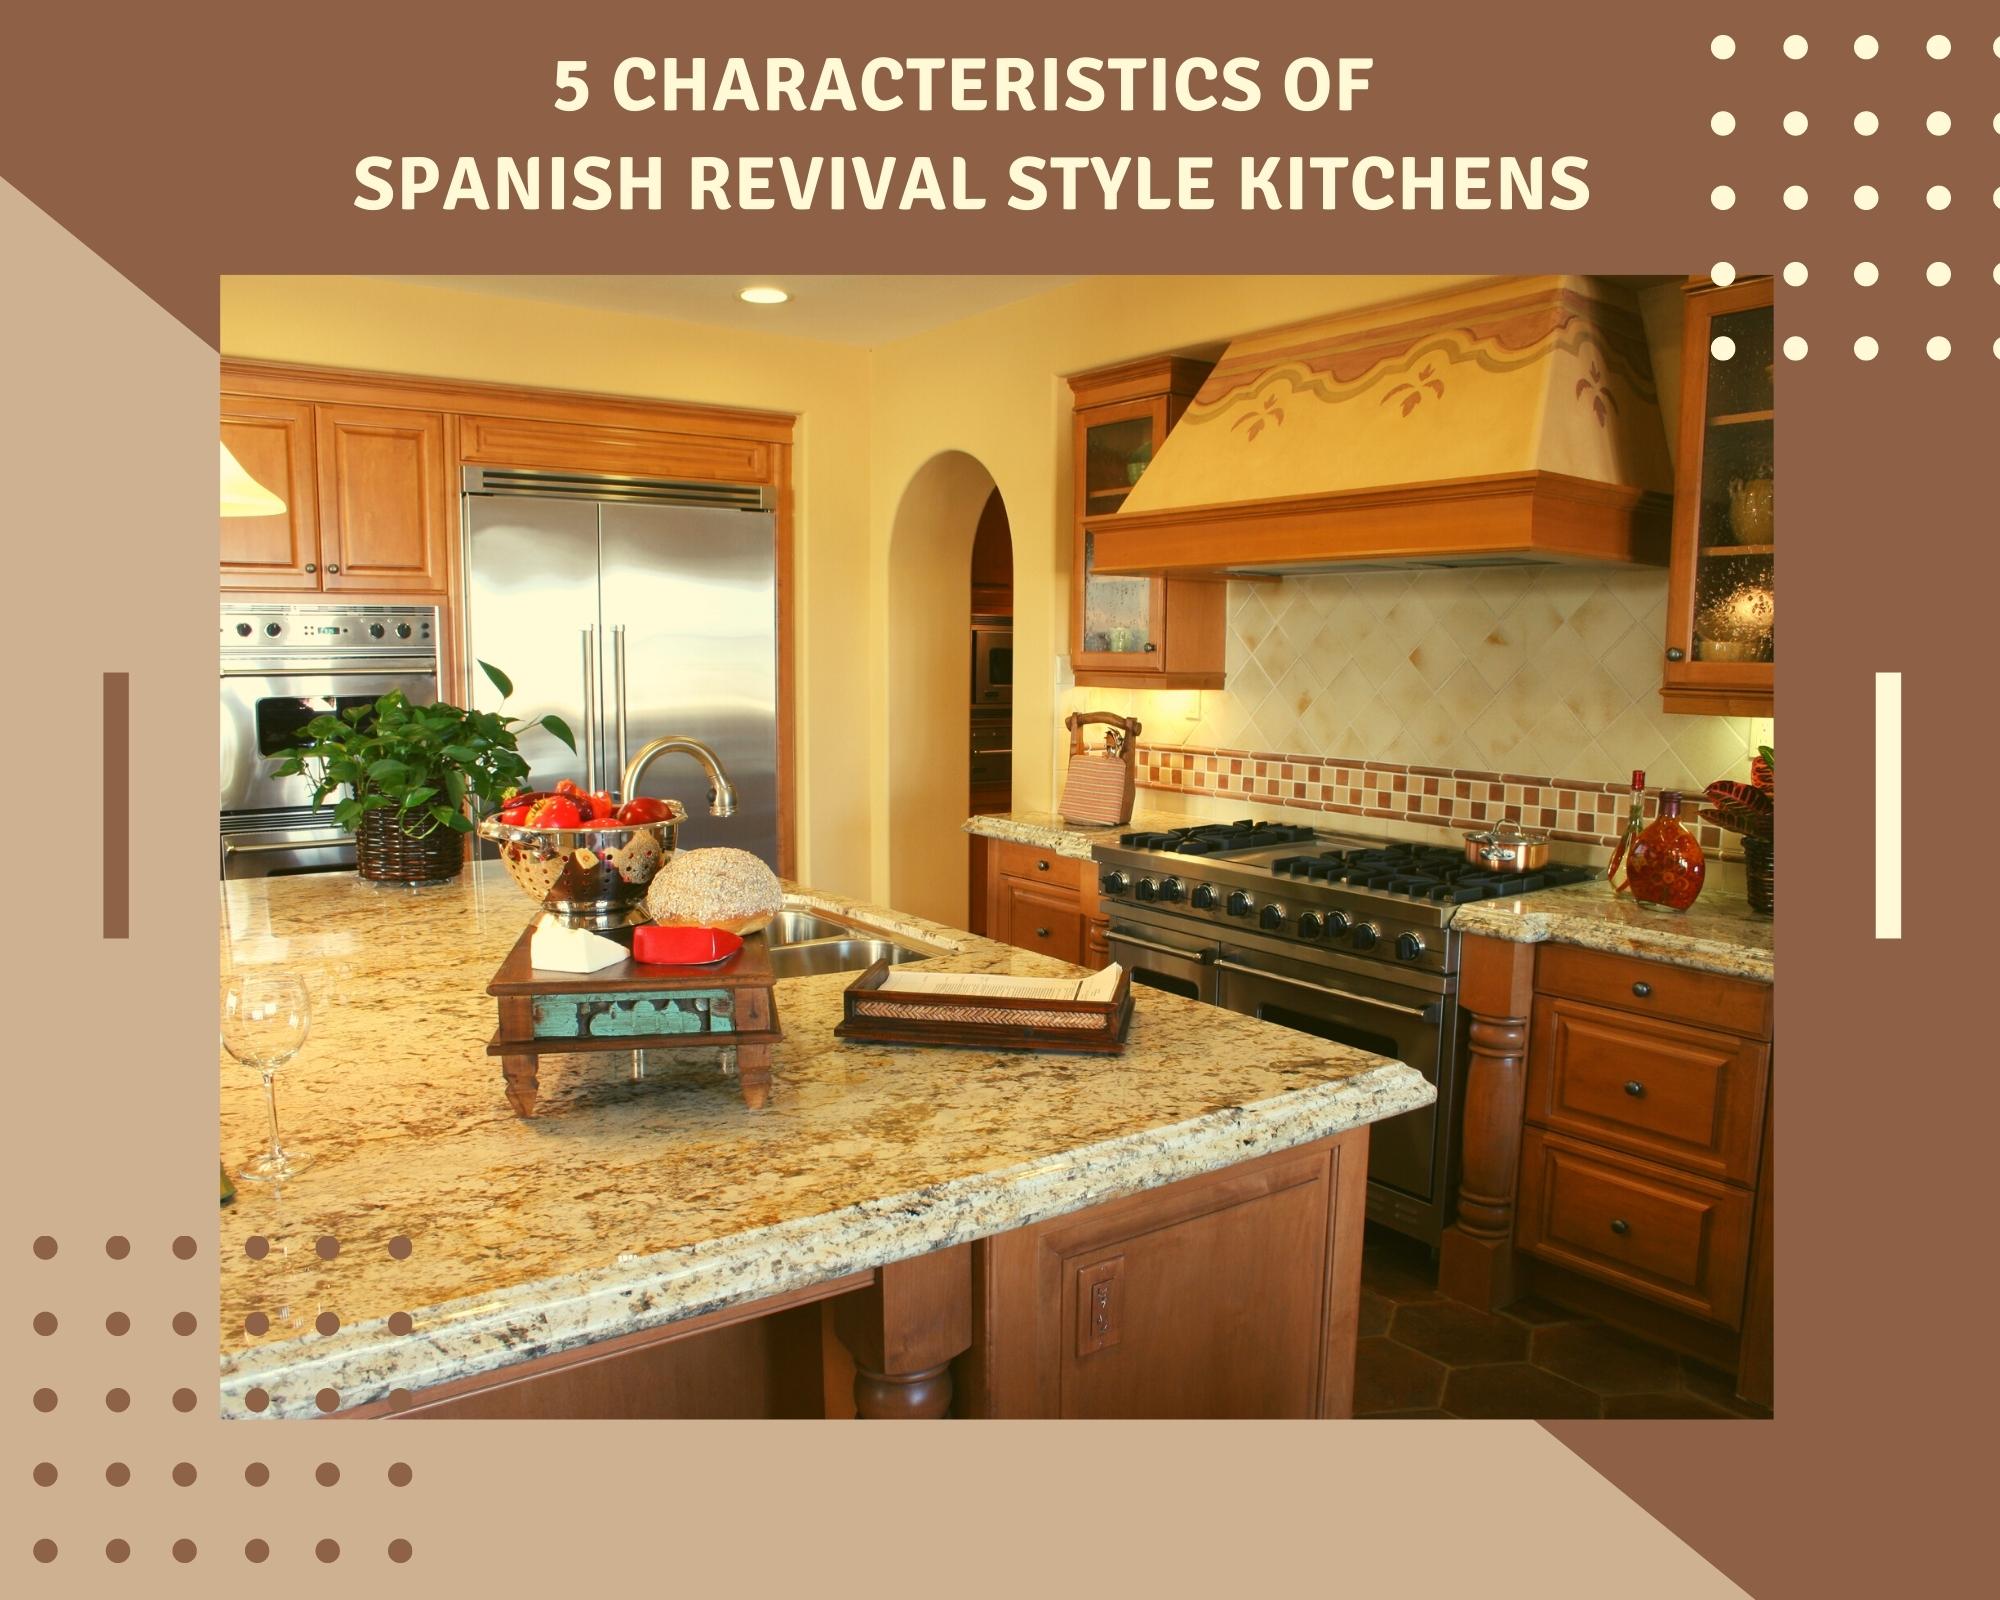 5 Characteristics Spanish Reviavl Style Kitchens